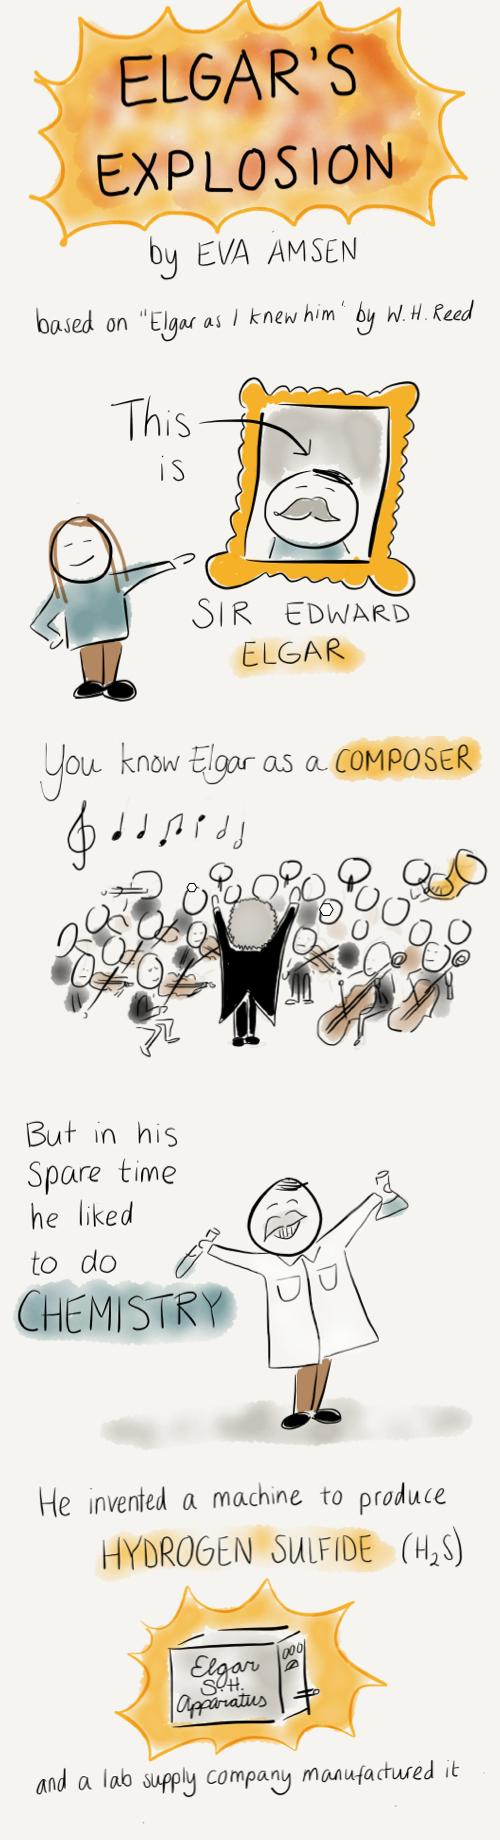 Elgar's explosion